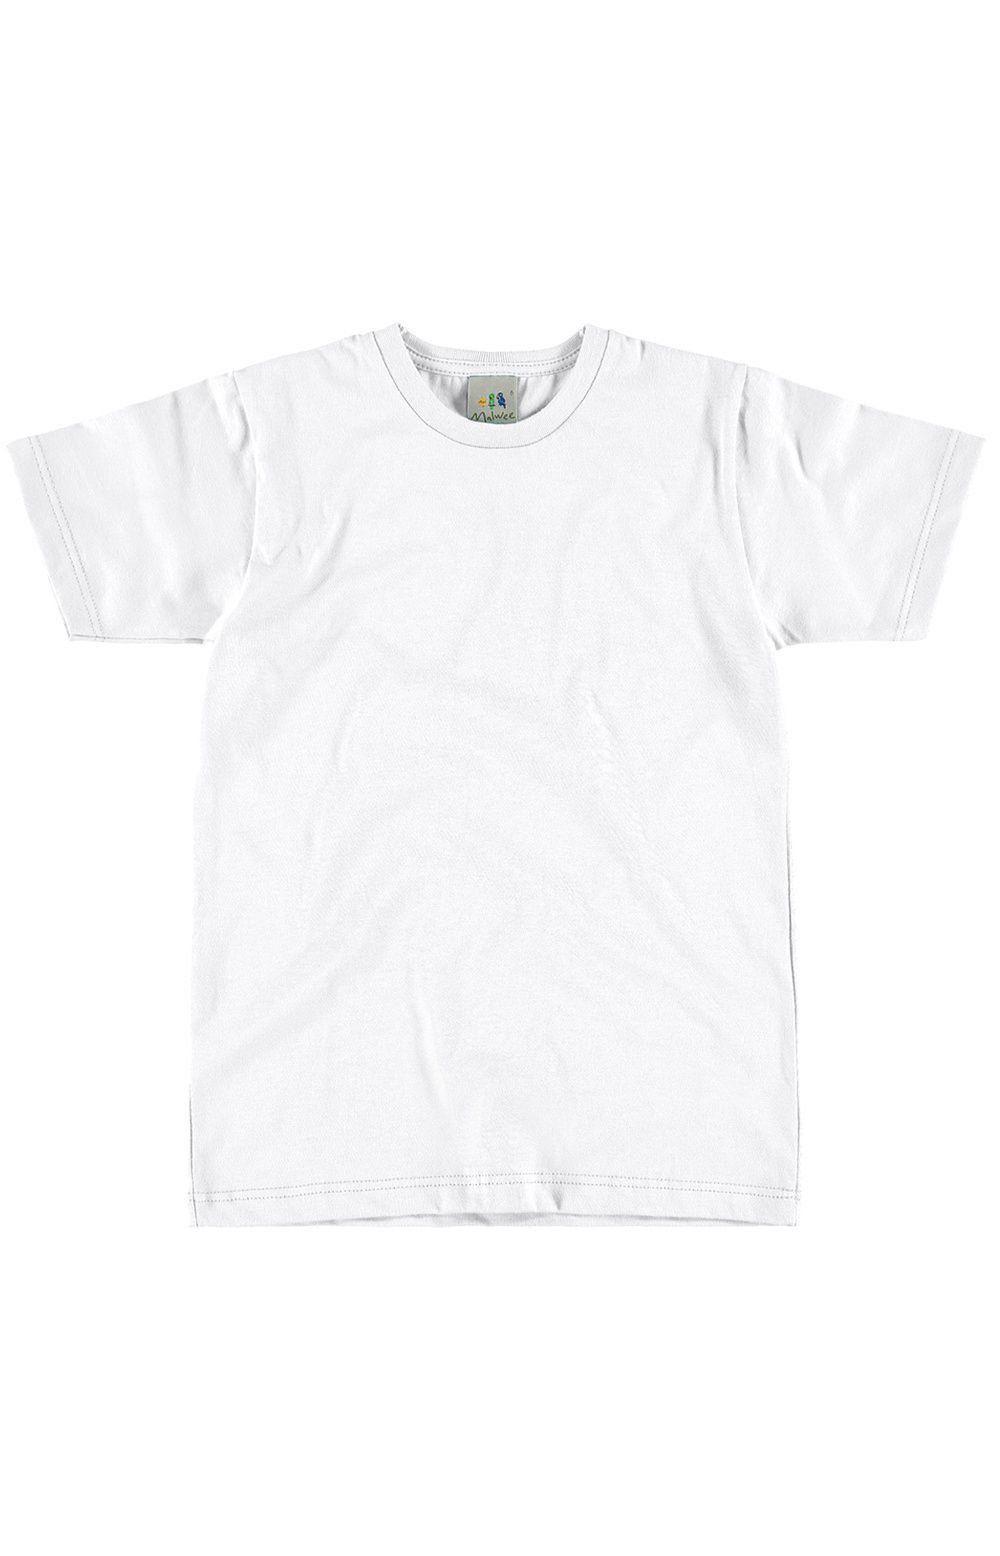 Camiseta Infantil Branca Masculina Malwee